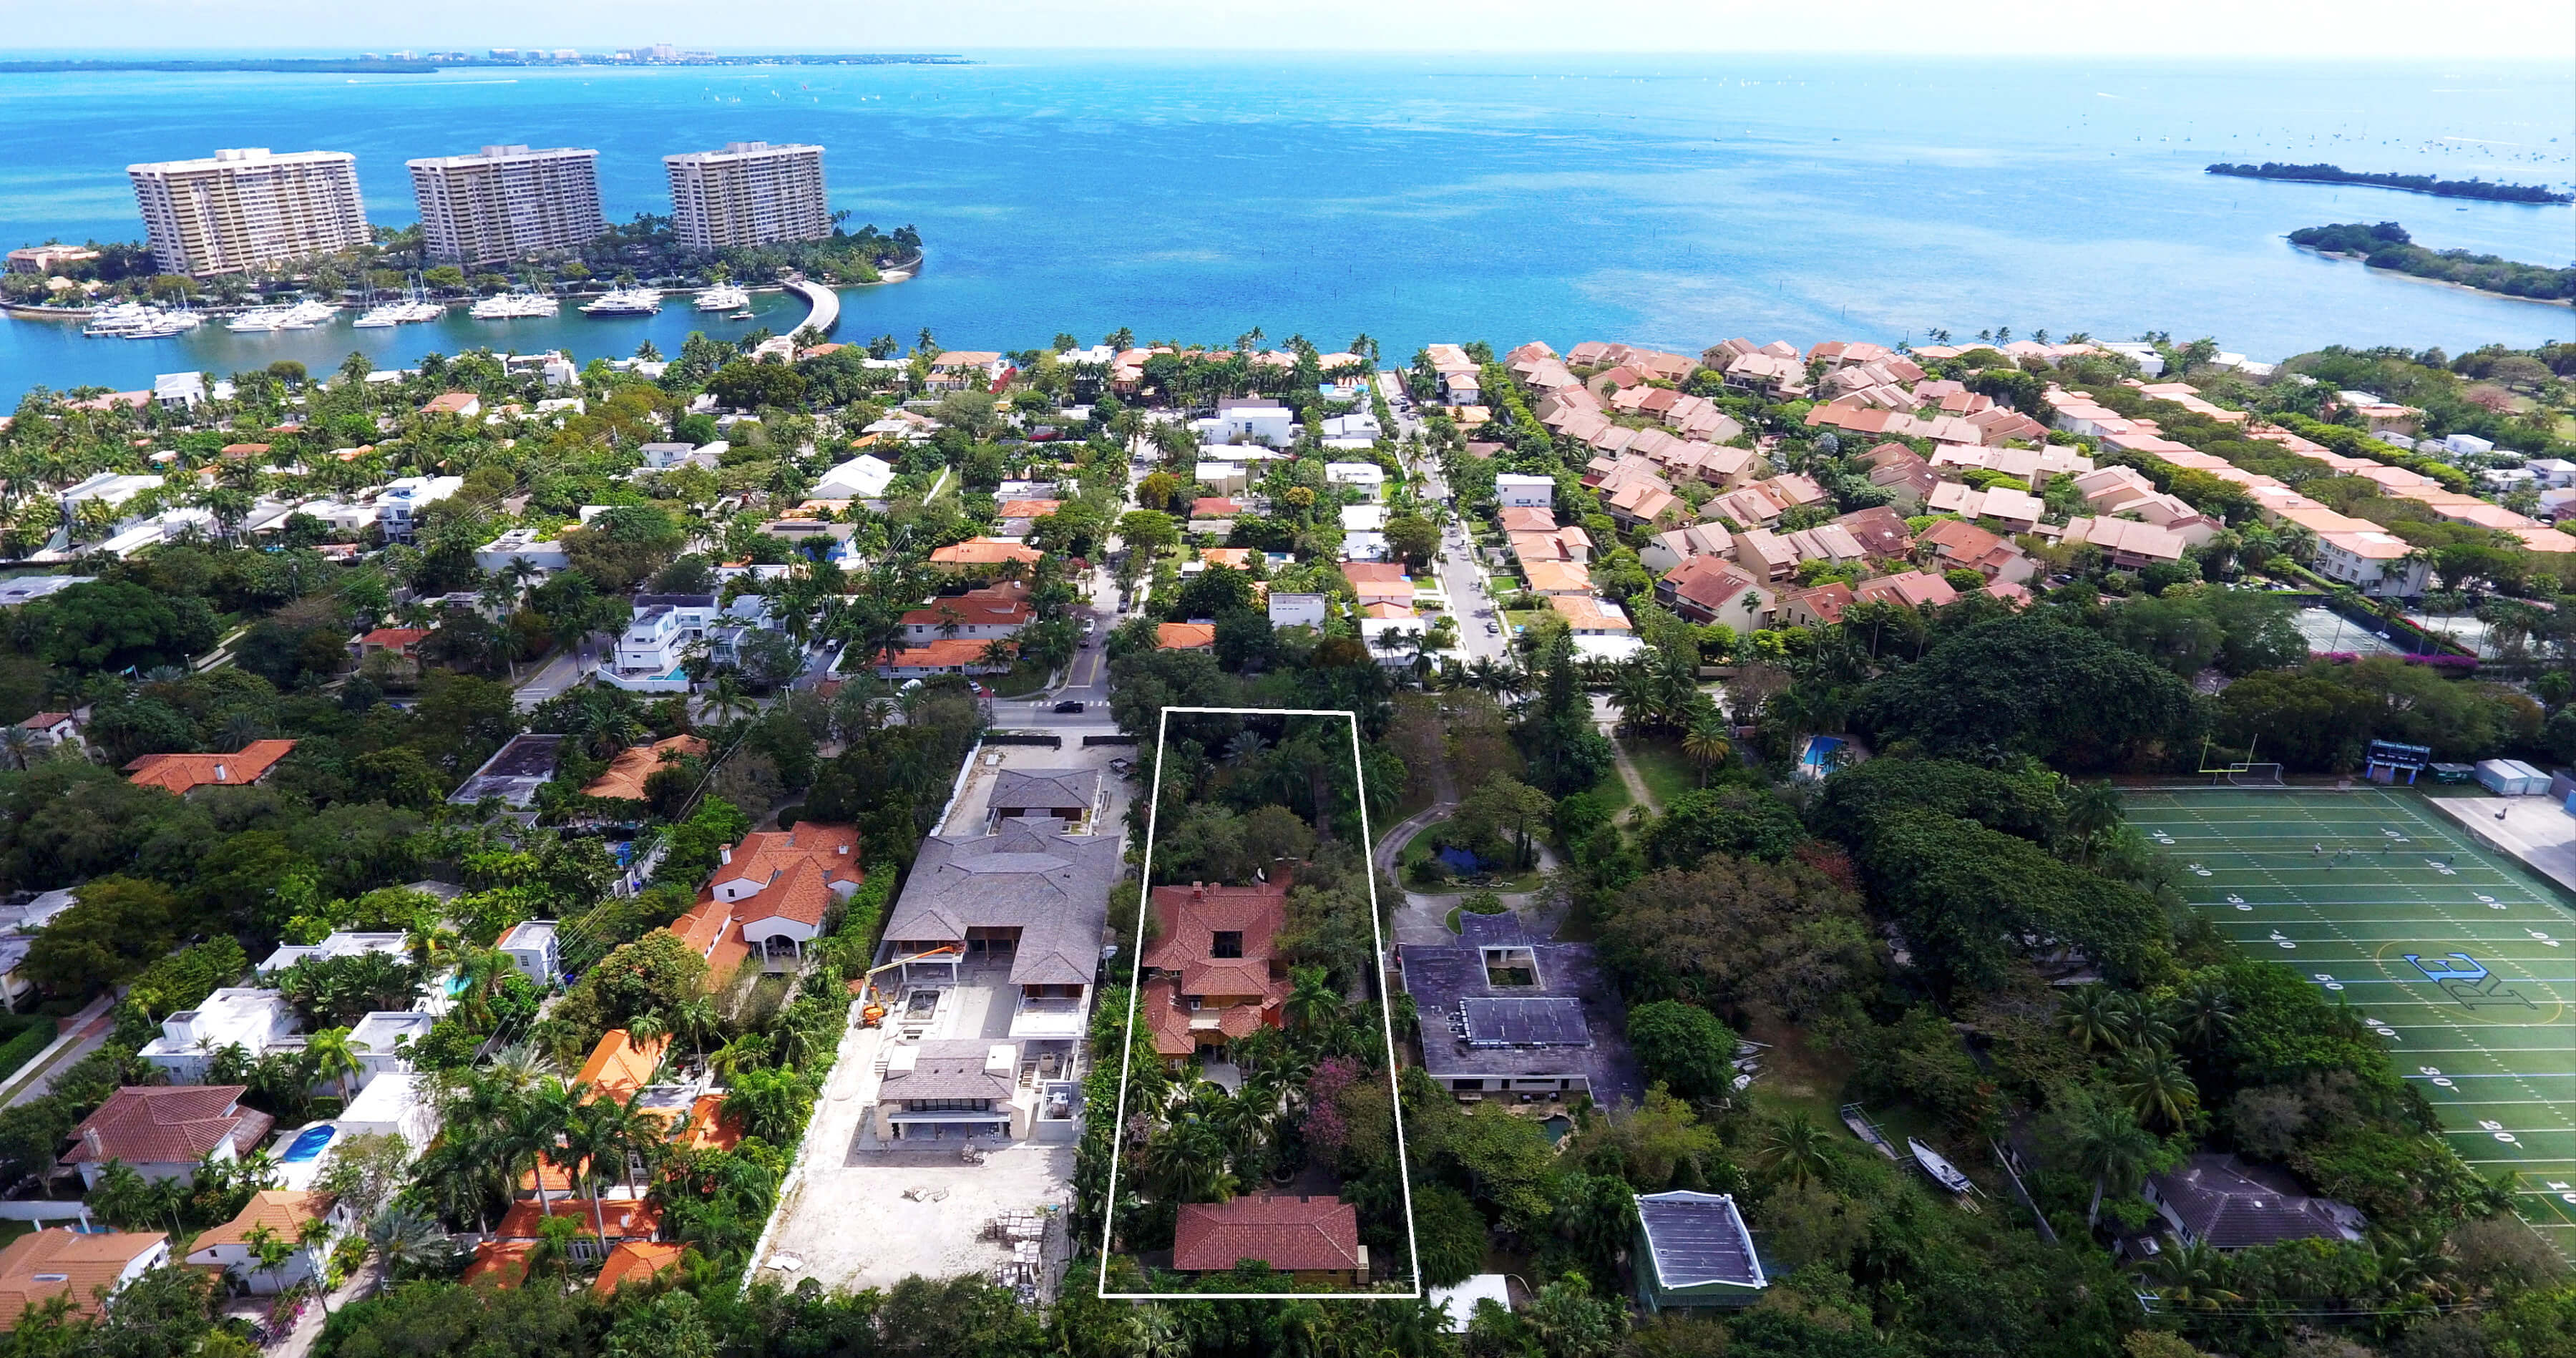 01_2_coconut_grove_aerial_photo_by_MiamiRealEstatePhotographers.com